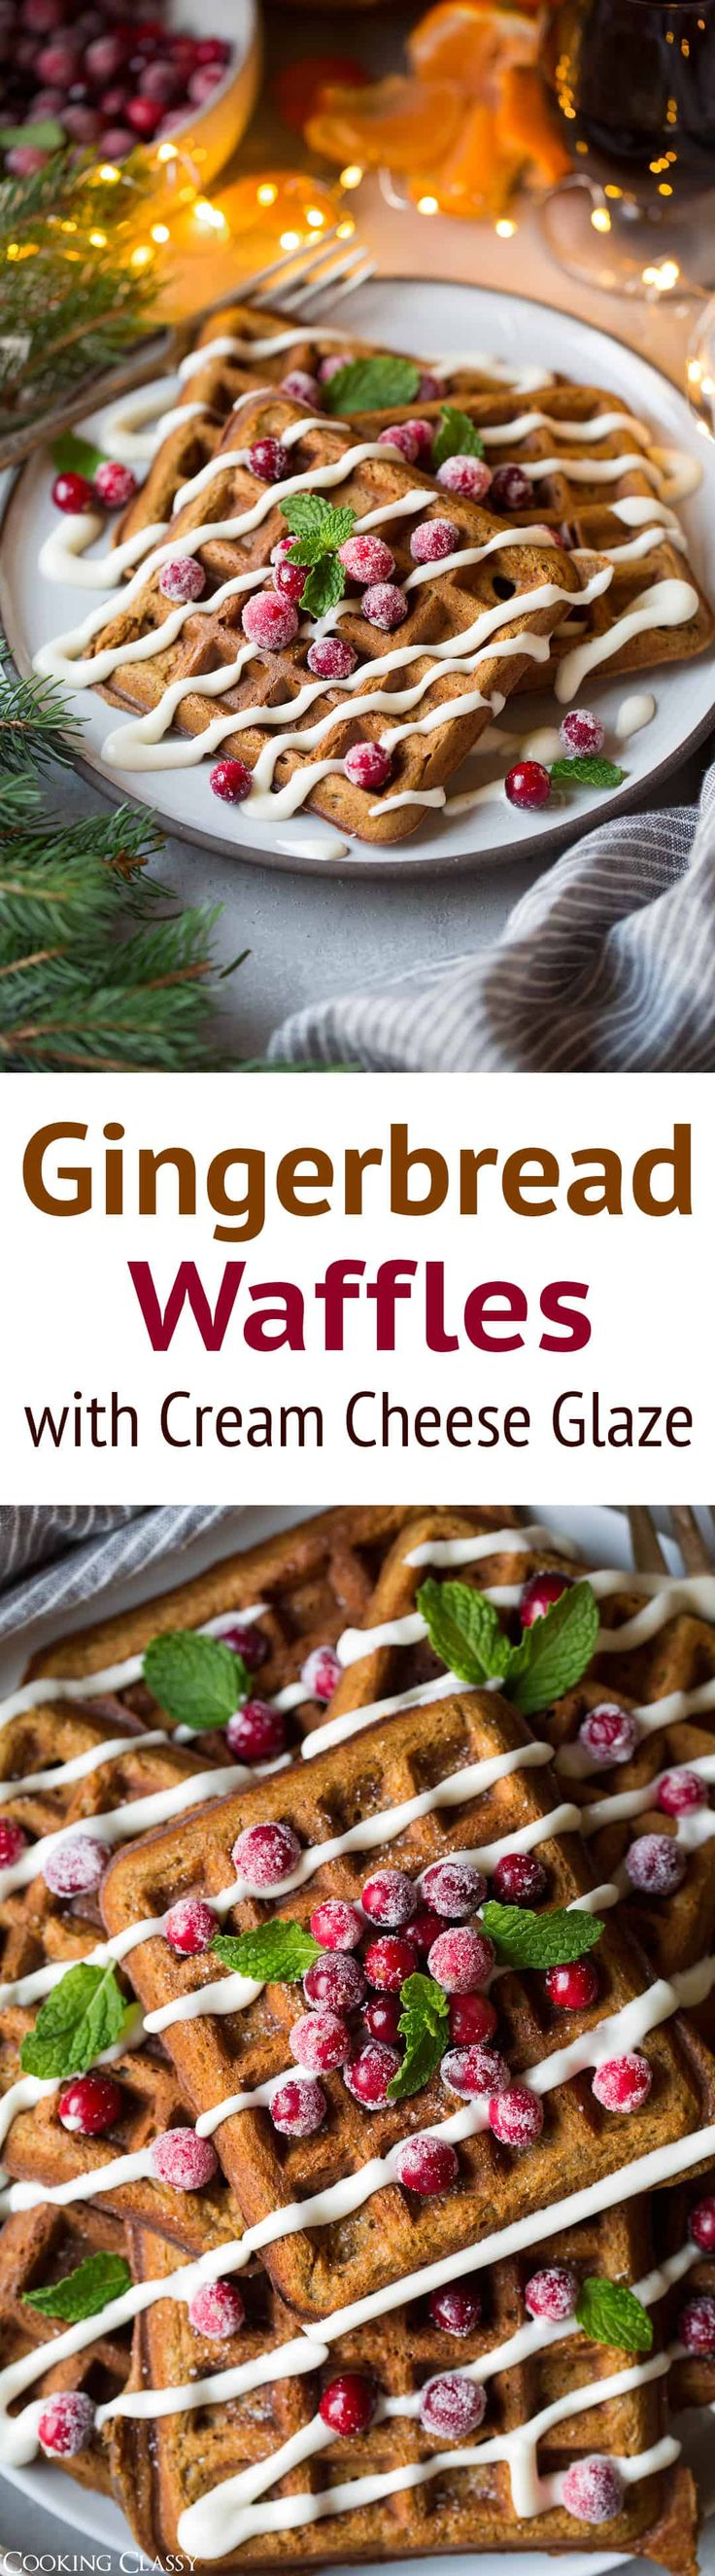 8827 best Food images on Pinterest